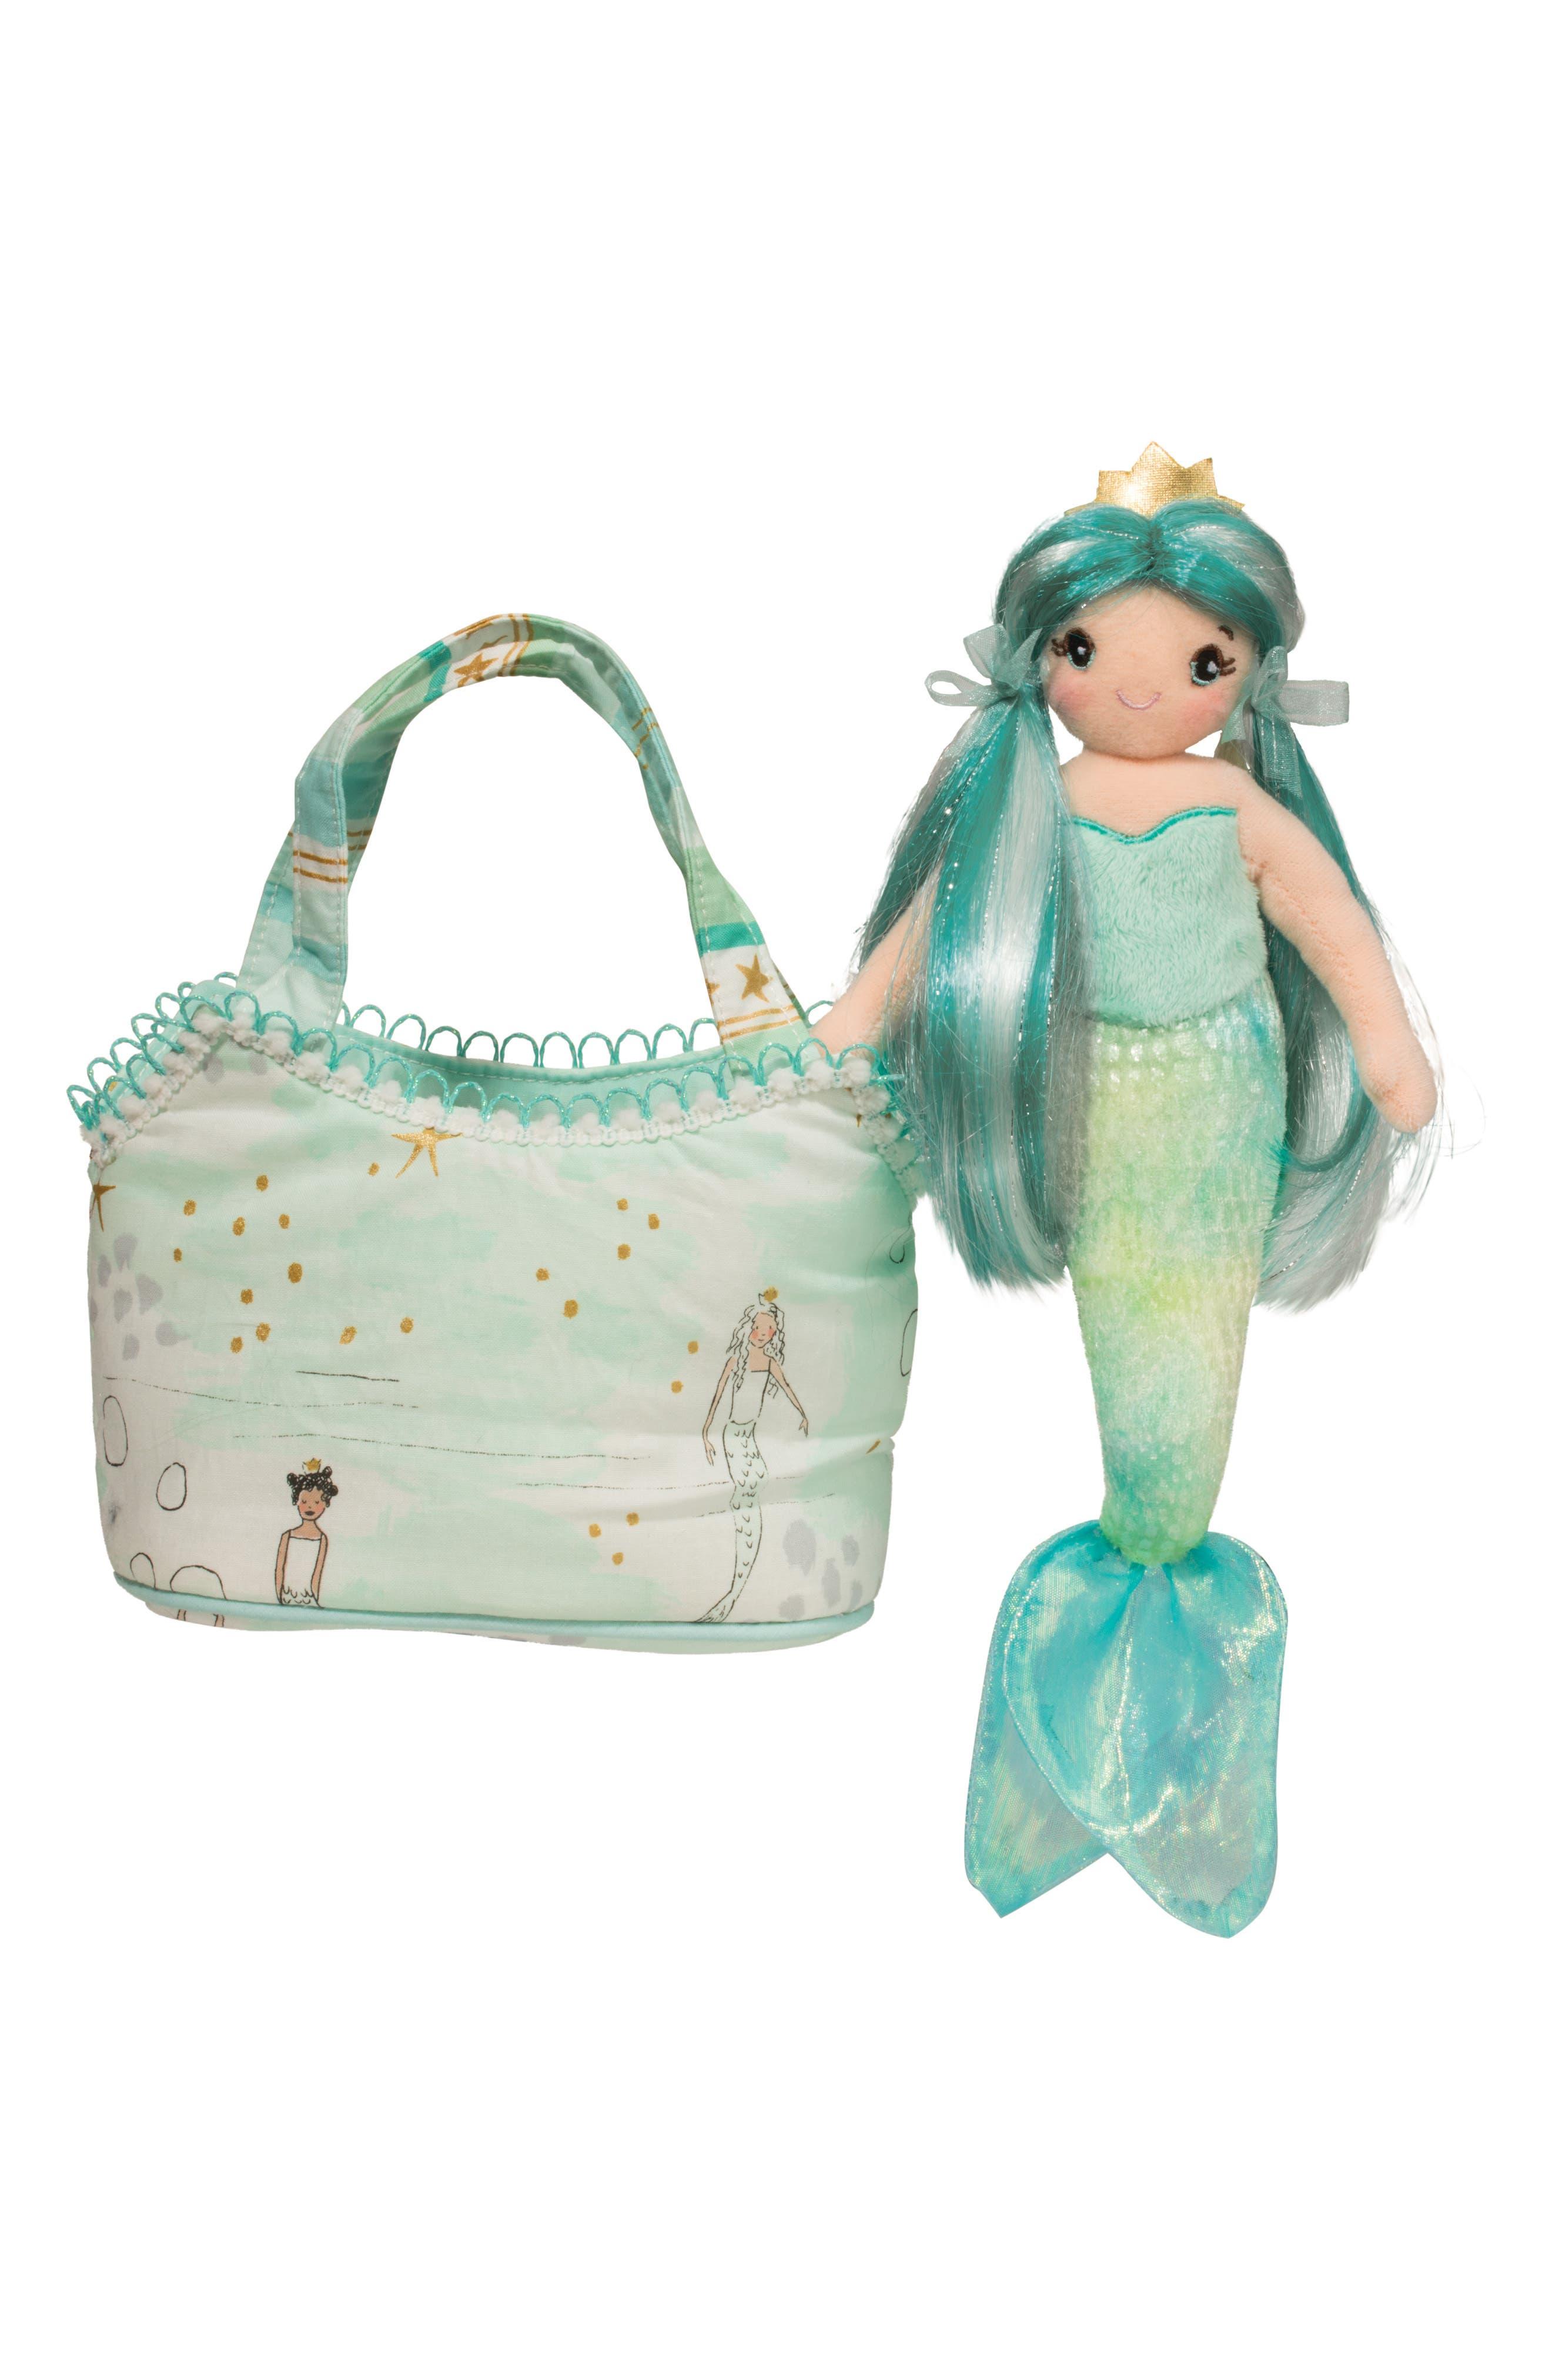 Douglas Princess Mermaid Doll & Handbag